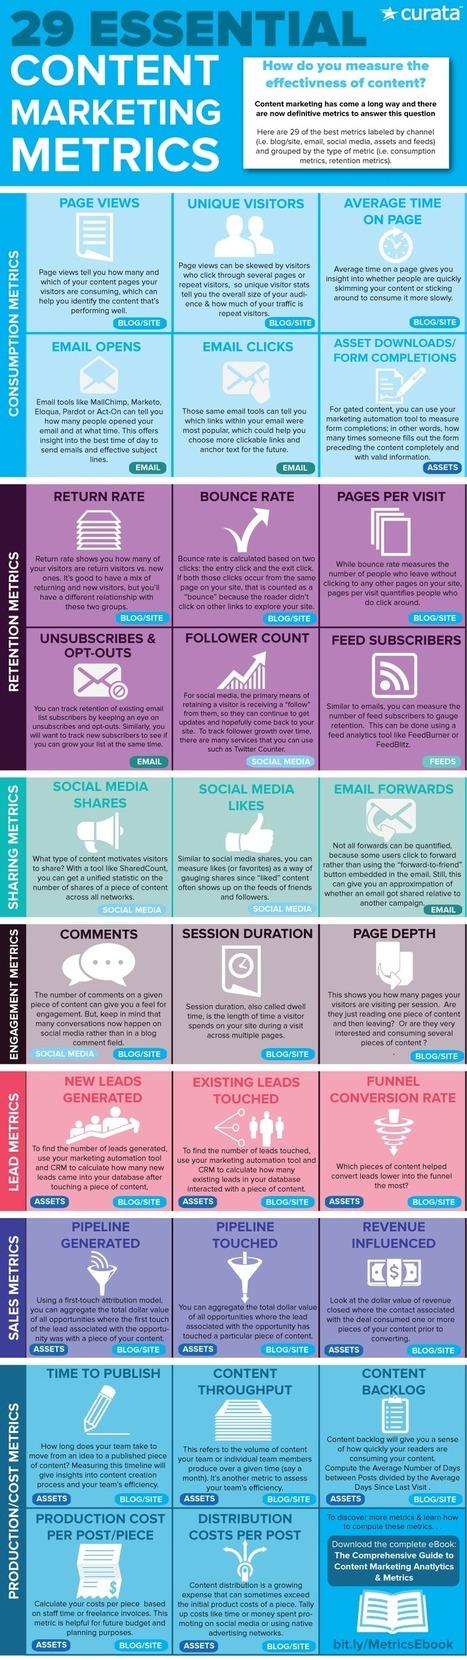 29 Vital Metrics to Measure Content Marketing Success #Infographic | MarketingHits | Scoop.it